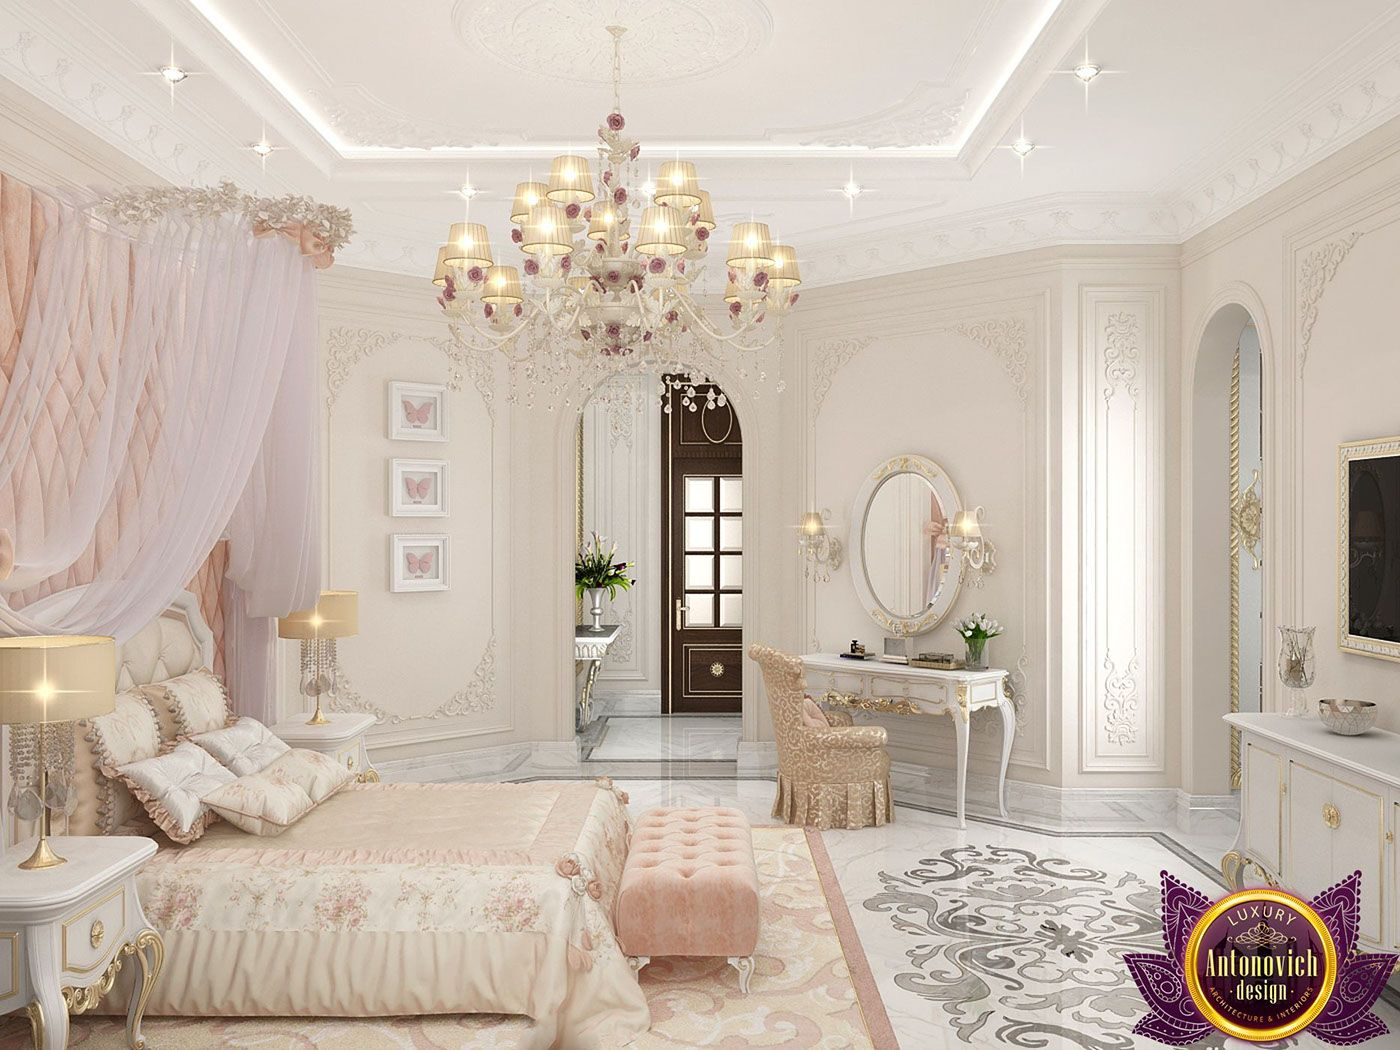 Pin By Virginia Amorim On Screenshots Luxurious Bedrooms Room Design Girls Room Design Luxury teenage girls bedroom